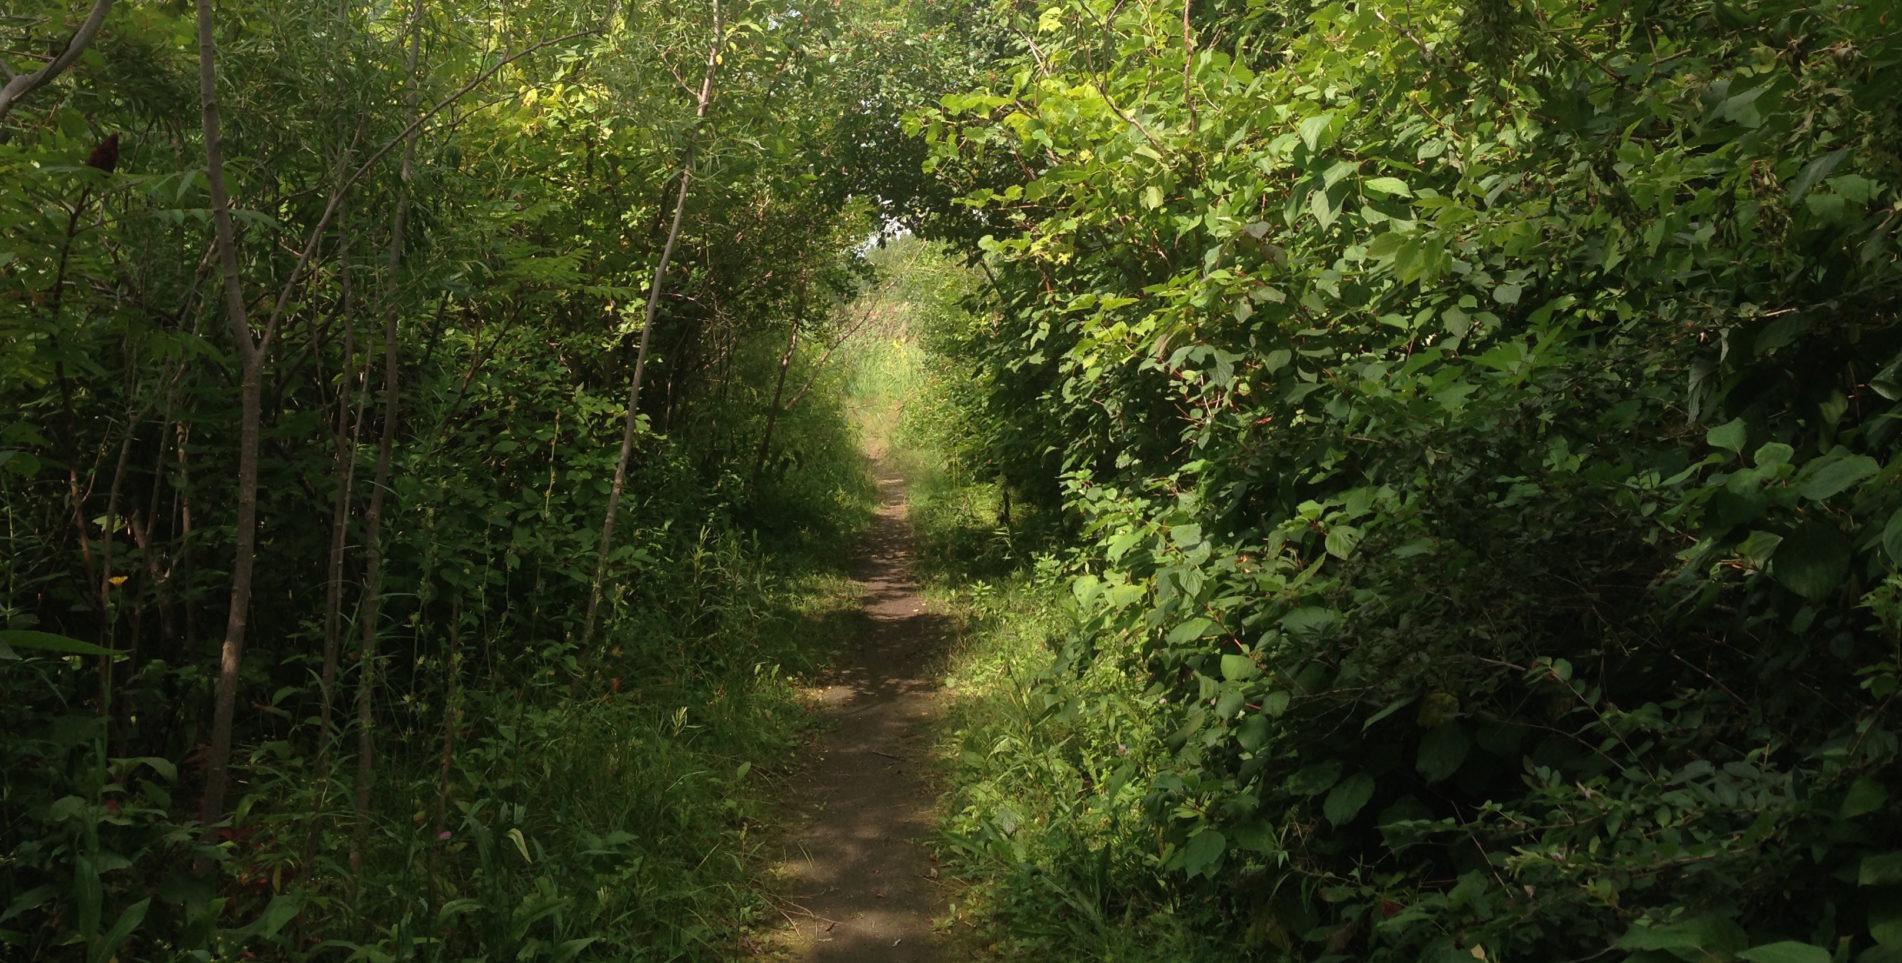 Chemin de nature verdoyante